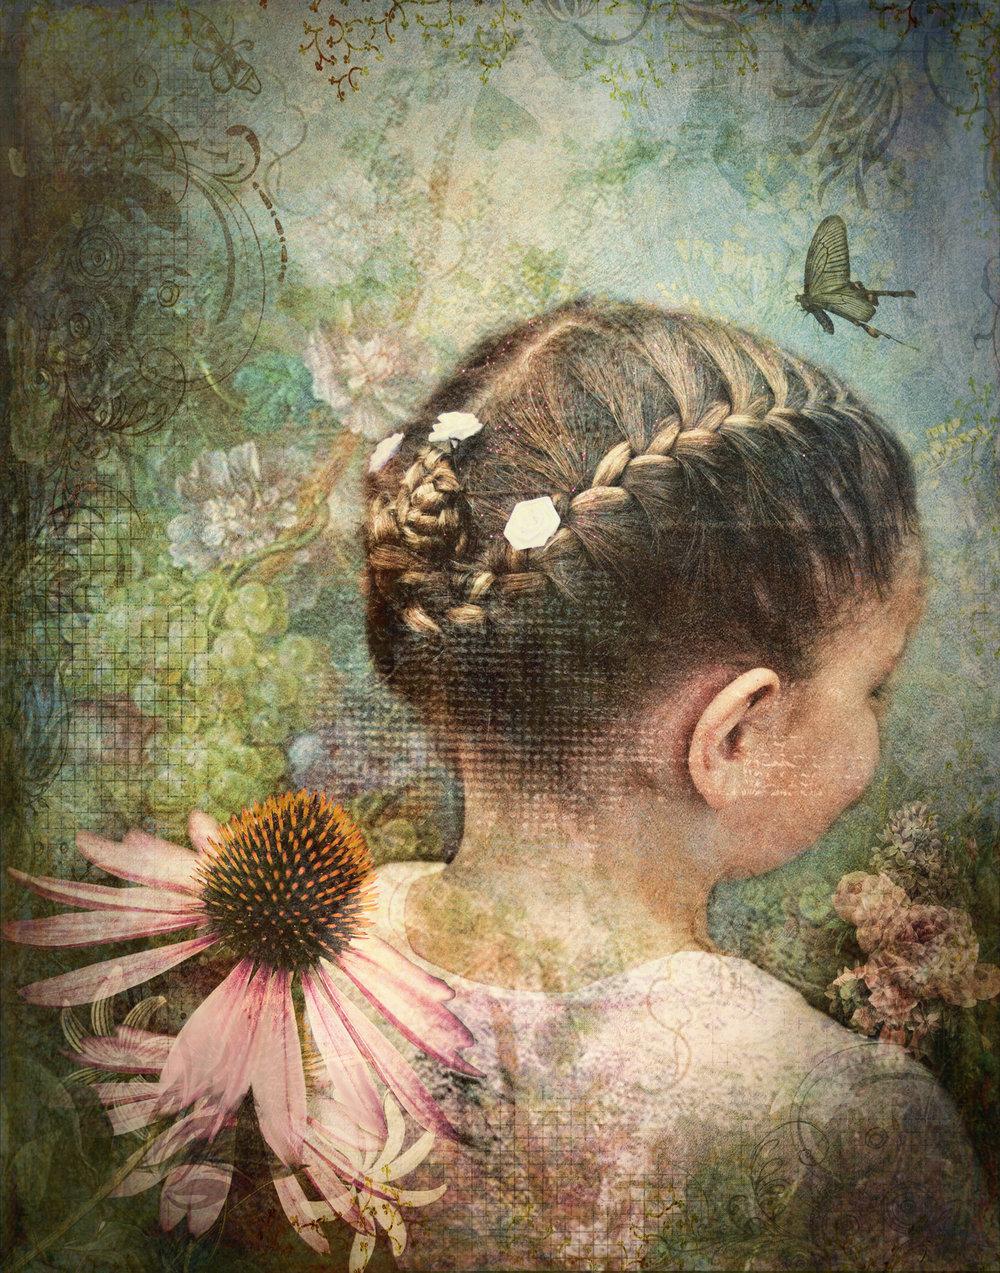 PaulaDPowers-Little Girls 2000 150 -1.jpg